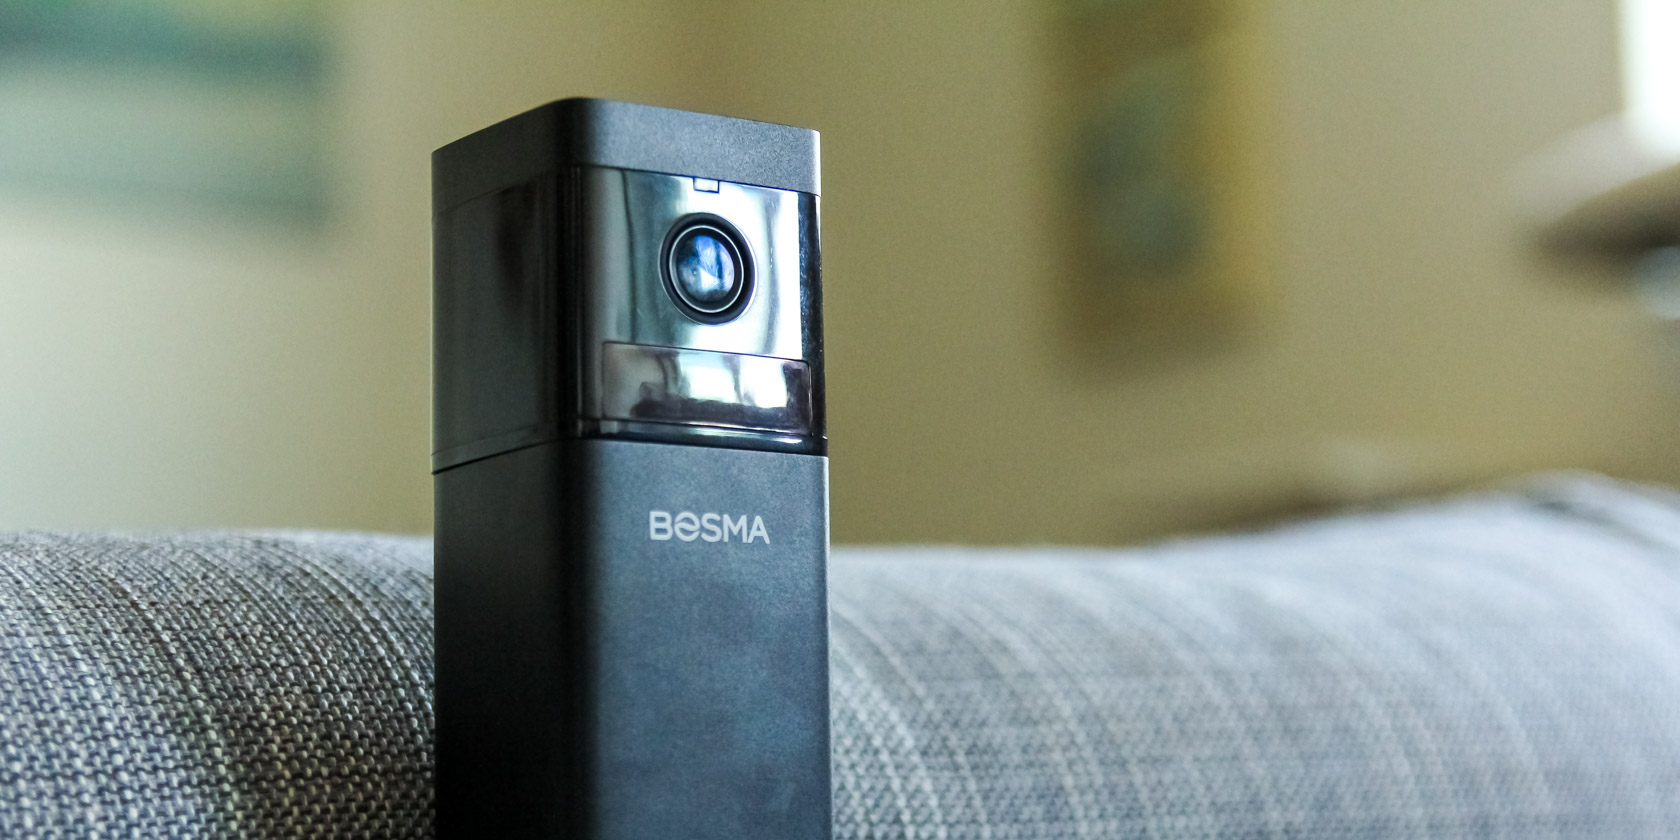 bosma-featured-1.jpg